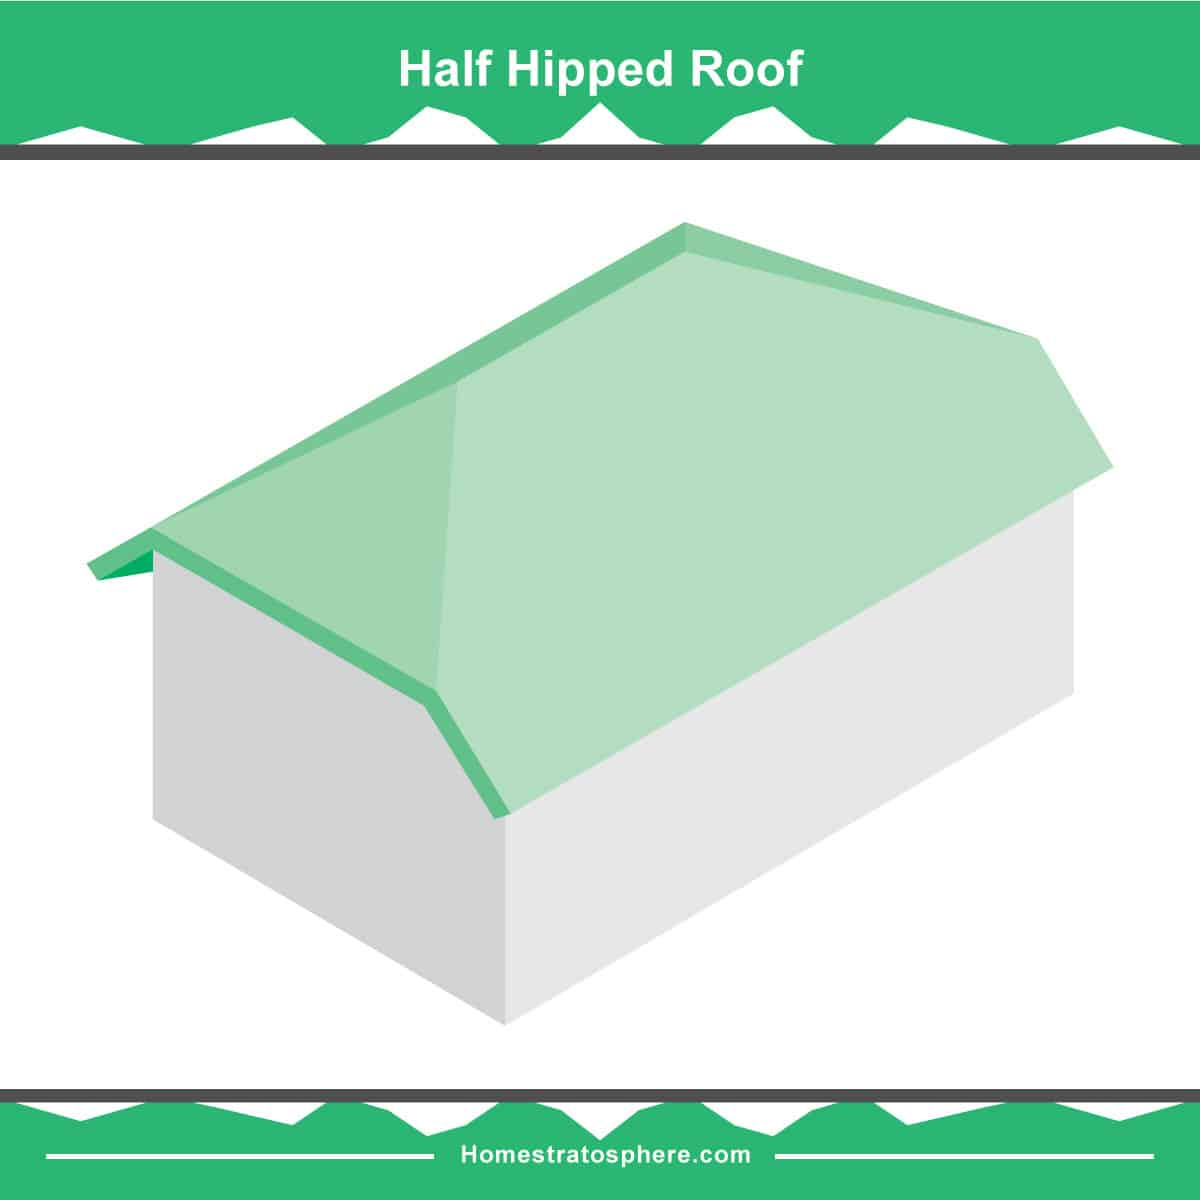 Half-hipped roof diagram